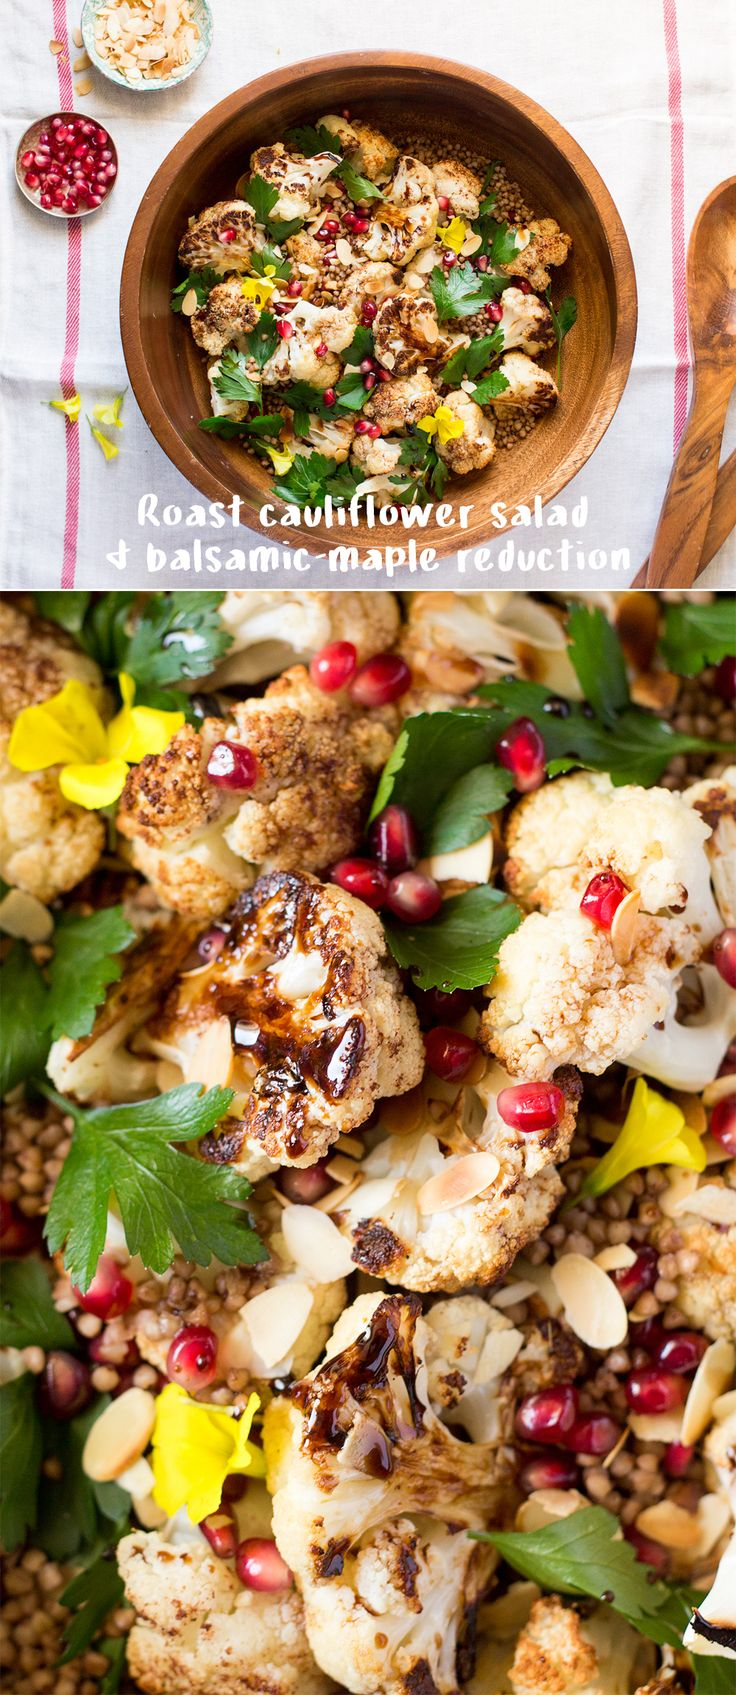 Roast cauliflower salad with balsamic-maple reduction